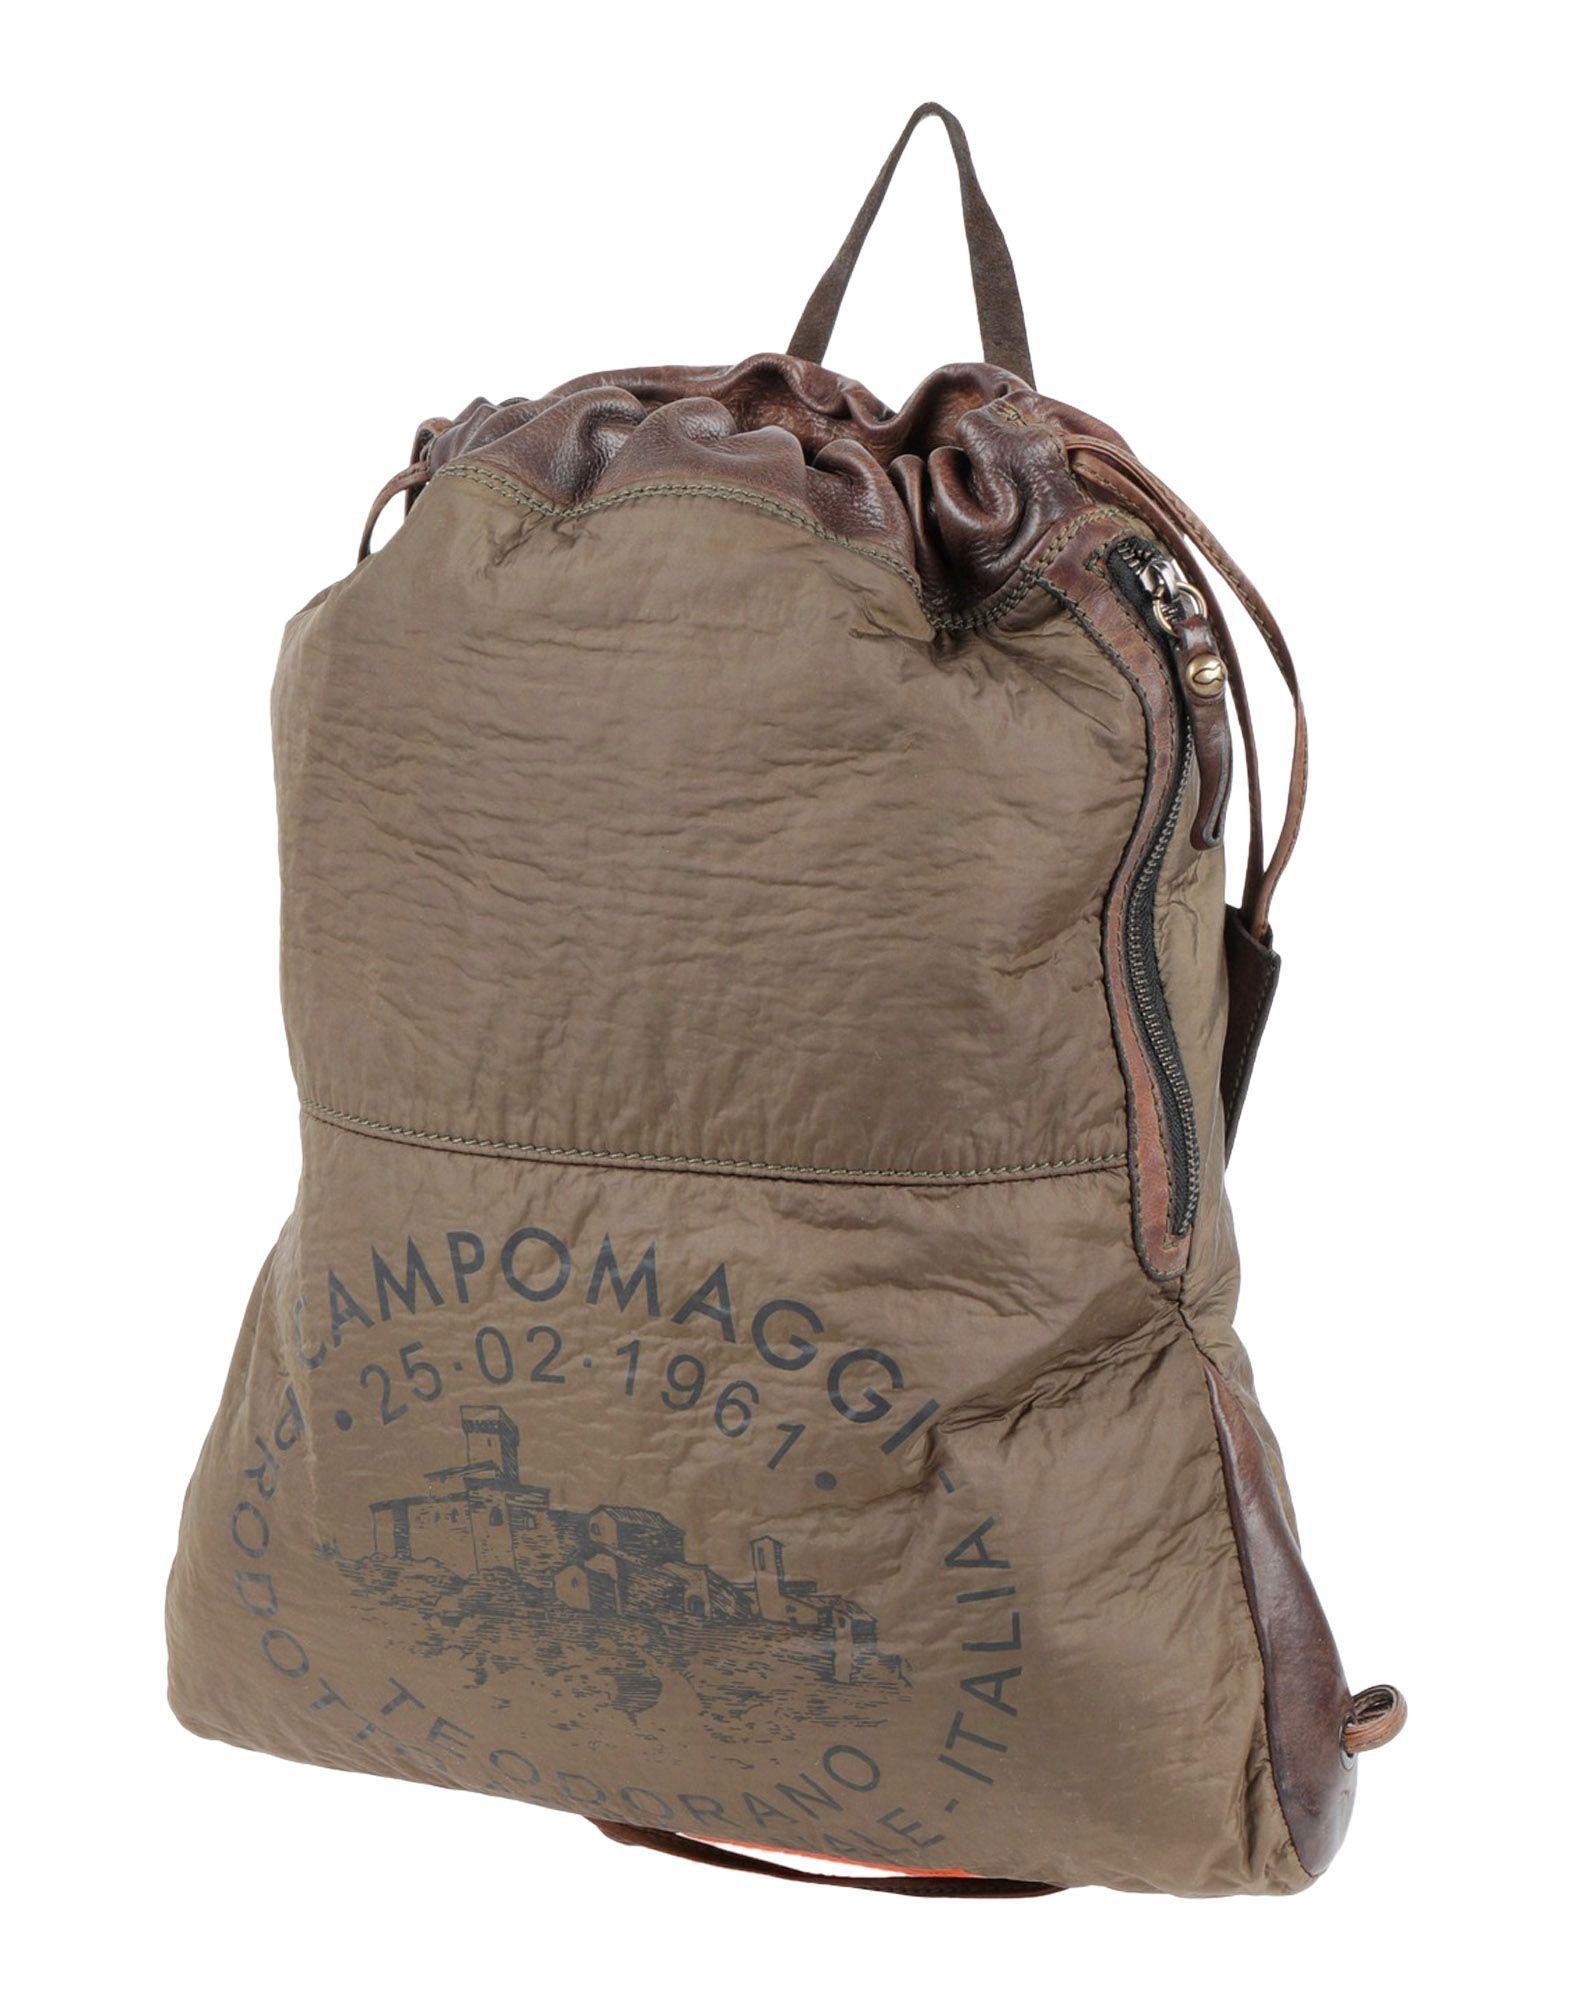 CAMPOMAGGI Backpacks & Fanny Packs in Green